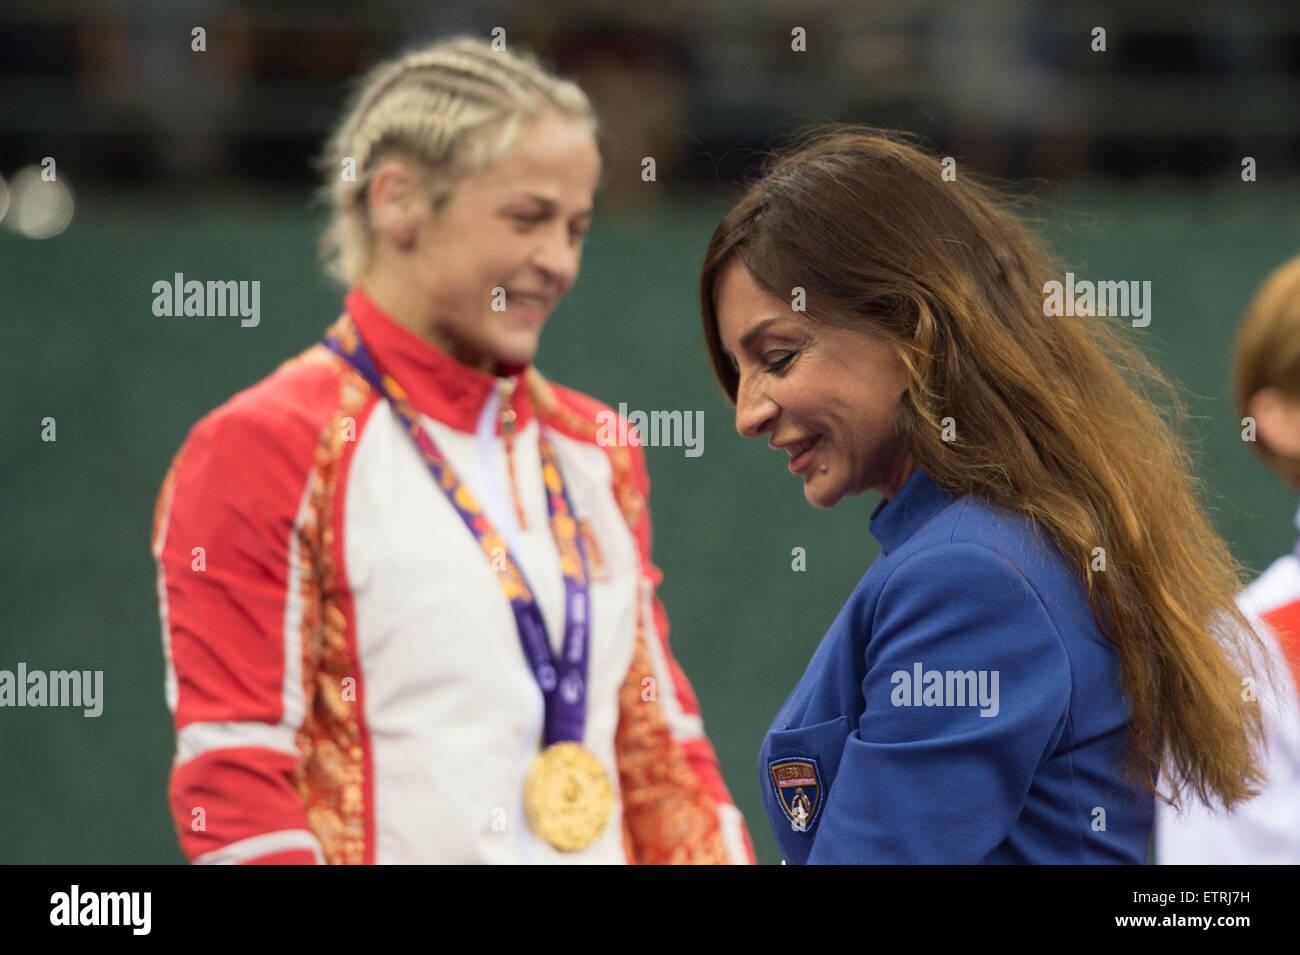 Mehriban Aliyeva (R), wife of President Ilham Aliyev, takes part in asherbaijanien gold medal winner Mariya Stadnyk's - Stock Image